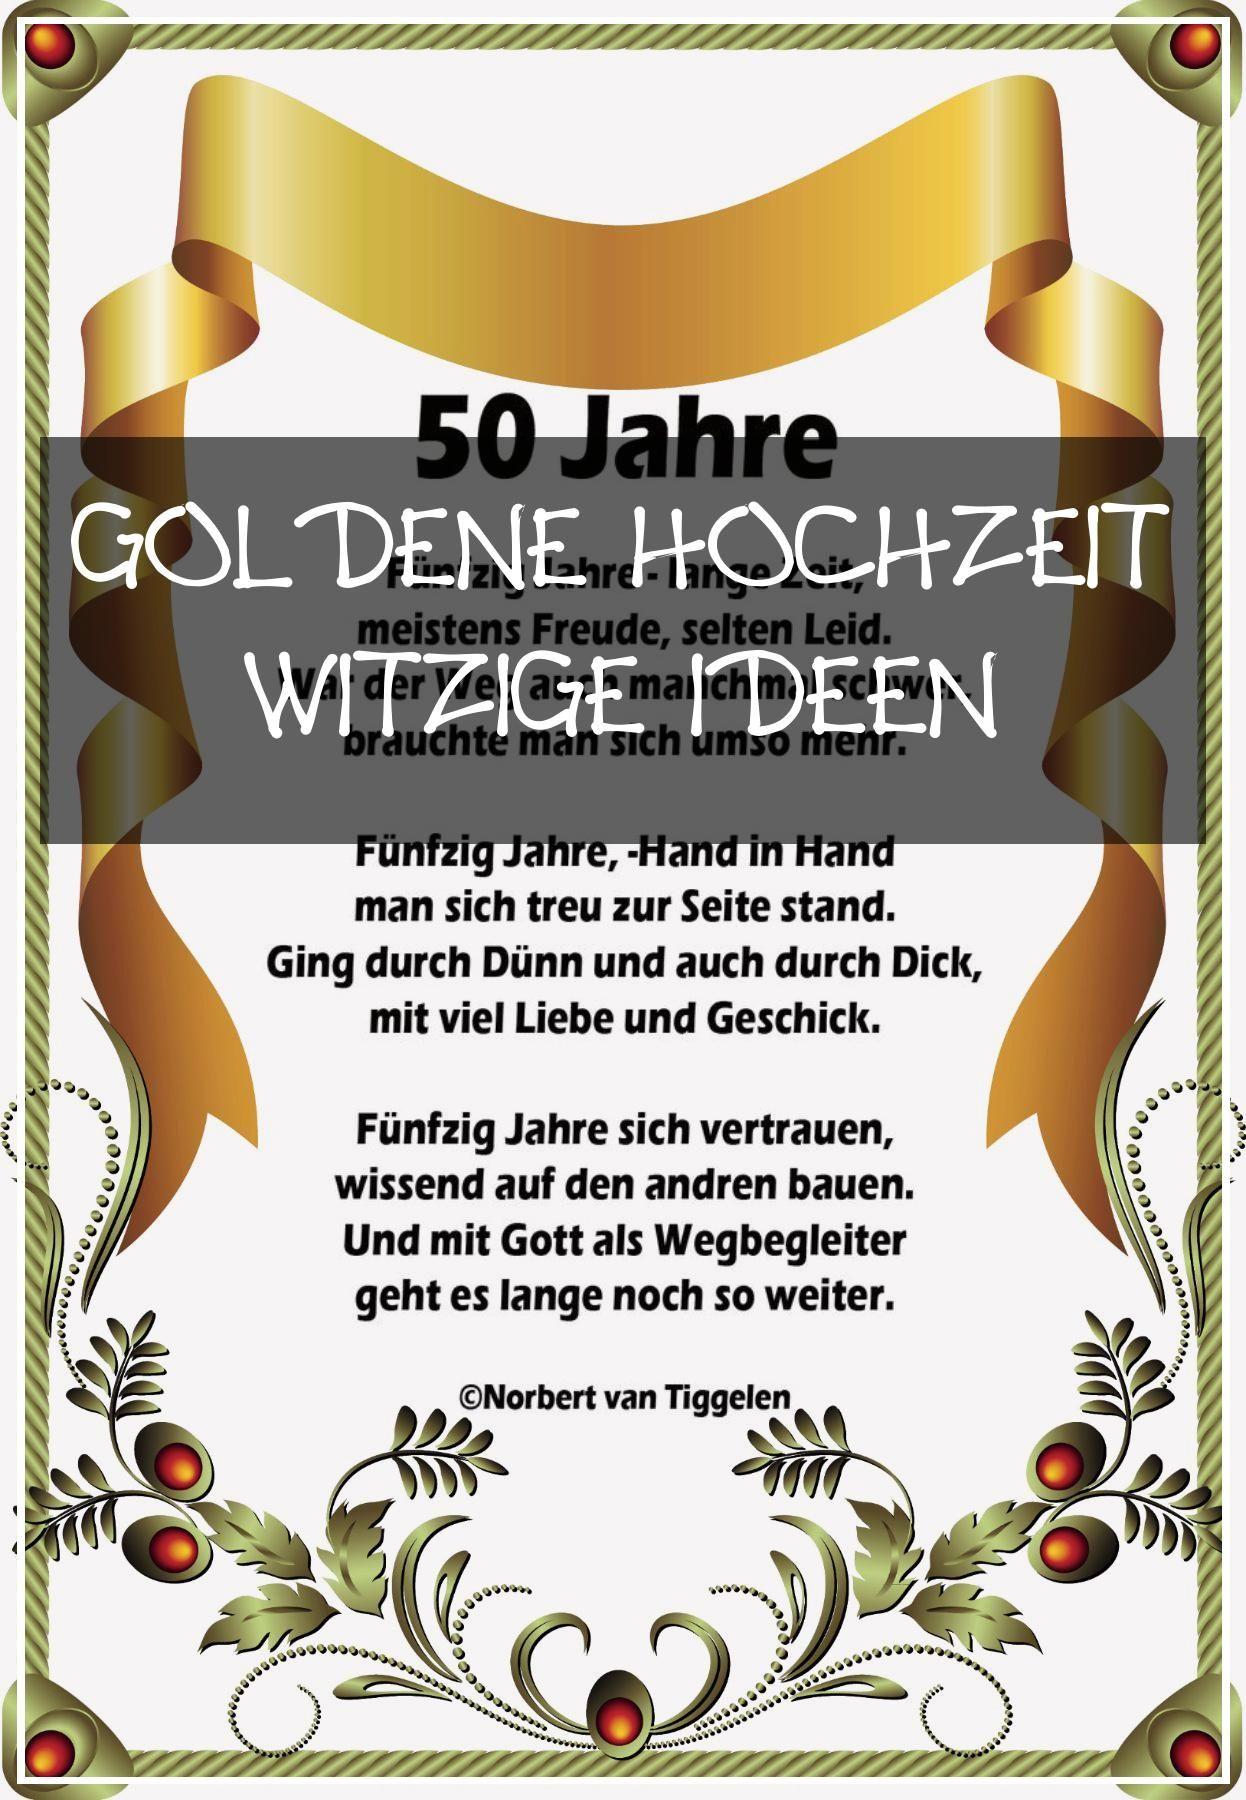 Perfect 16 Goldene Hochzeit Witzige Ideen Goldene Hochzeit Hochzeit Ideen